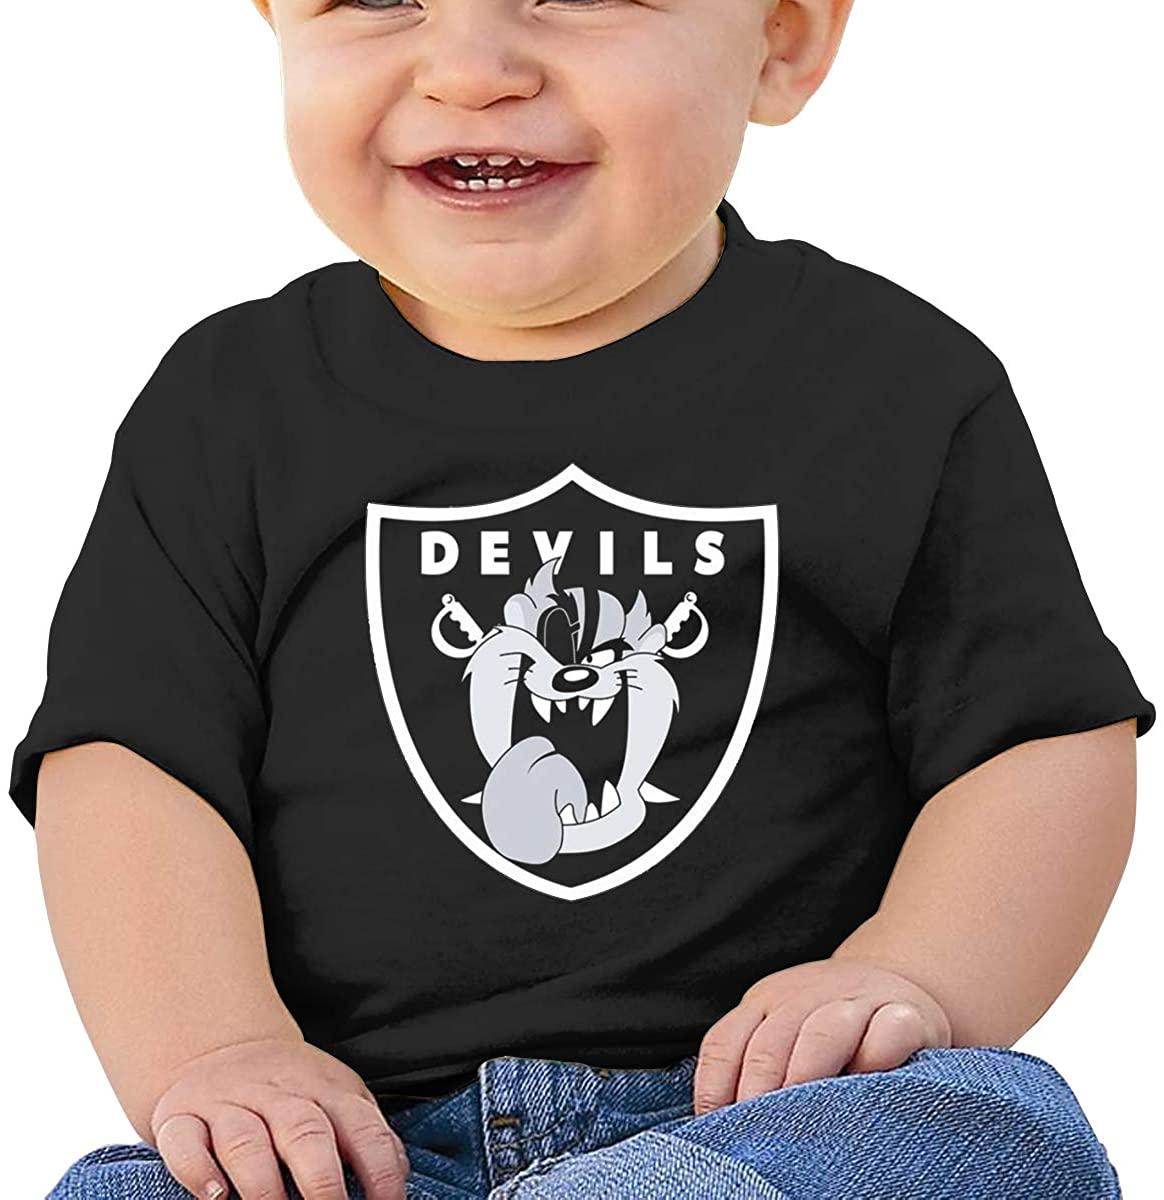 6-24 Months Boy and Girl Baby Short Sleeve T-Shirt Looney Tunes Tasmanian Devil Taz Original Minimalist Style Black